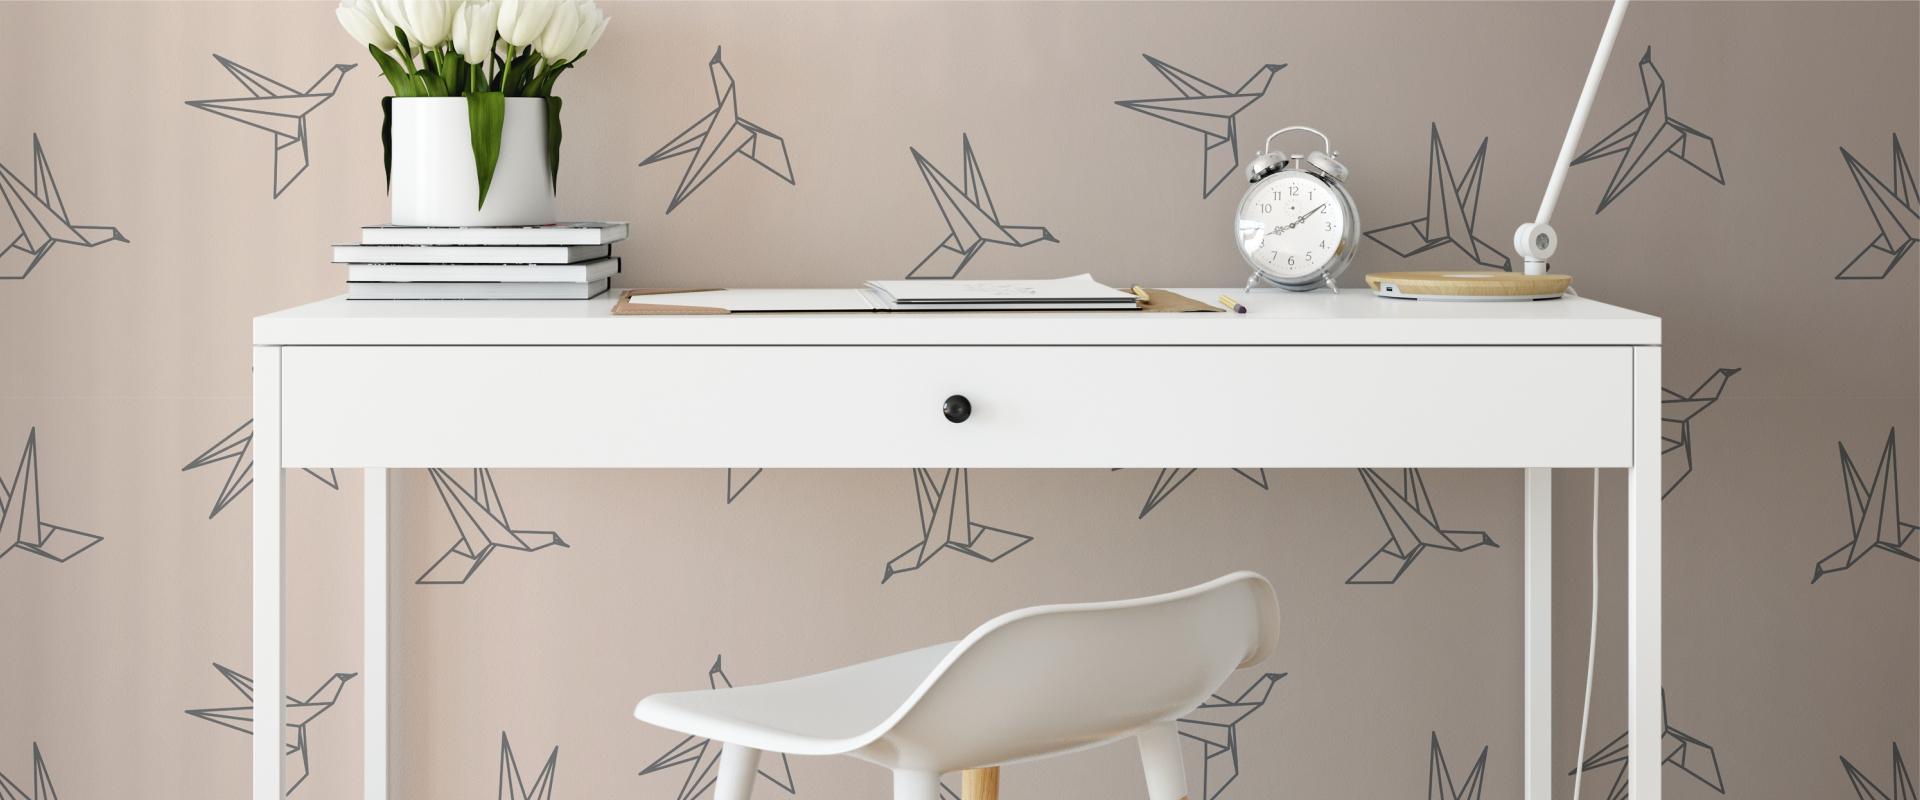 Hello Sticky - Peel &Amp; Stick Removable Wallpaper Faqs - Mobile Header